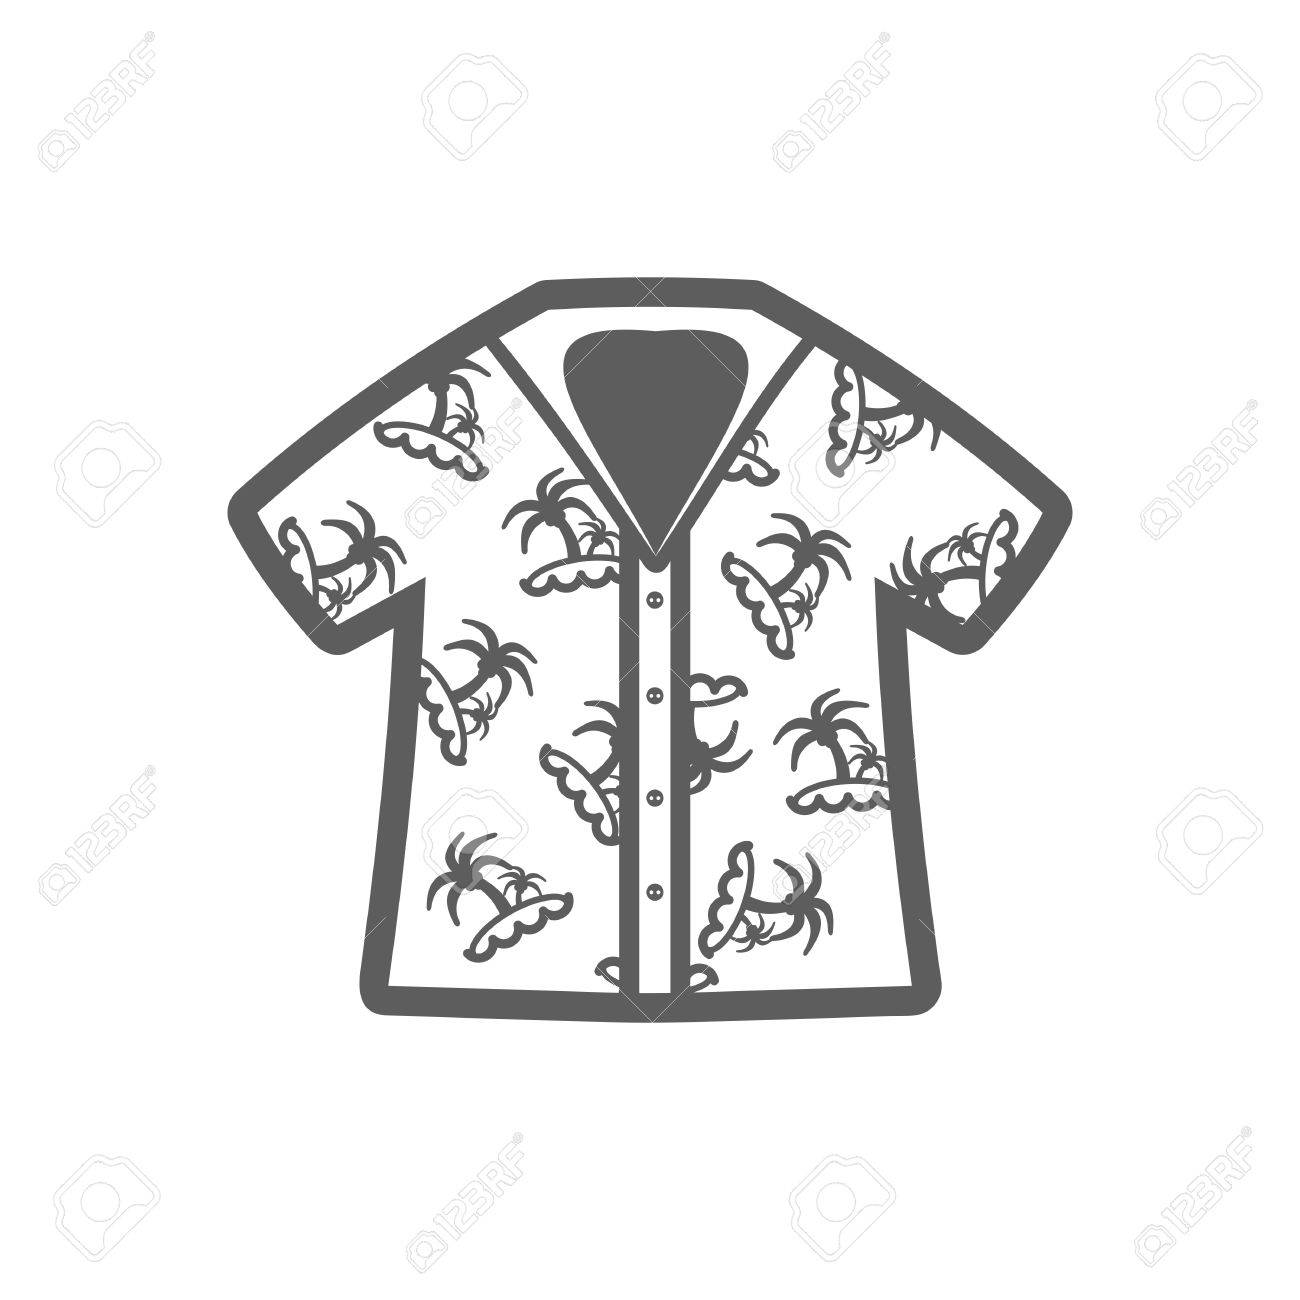 42ae2a11e Hawaiian Shirt with palm tree outline vector icon. Beach. Summer.  Summertime. Holiday